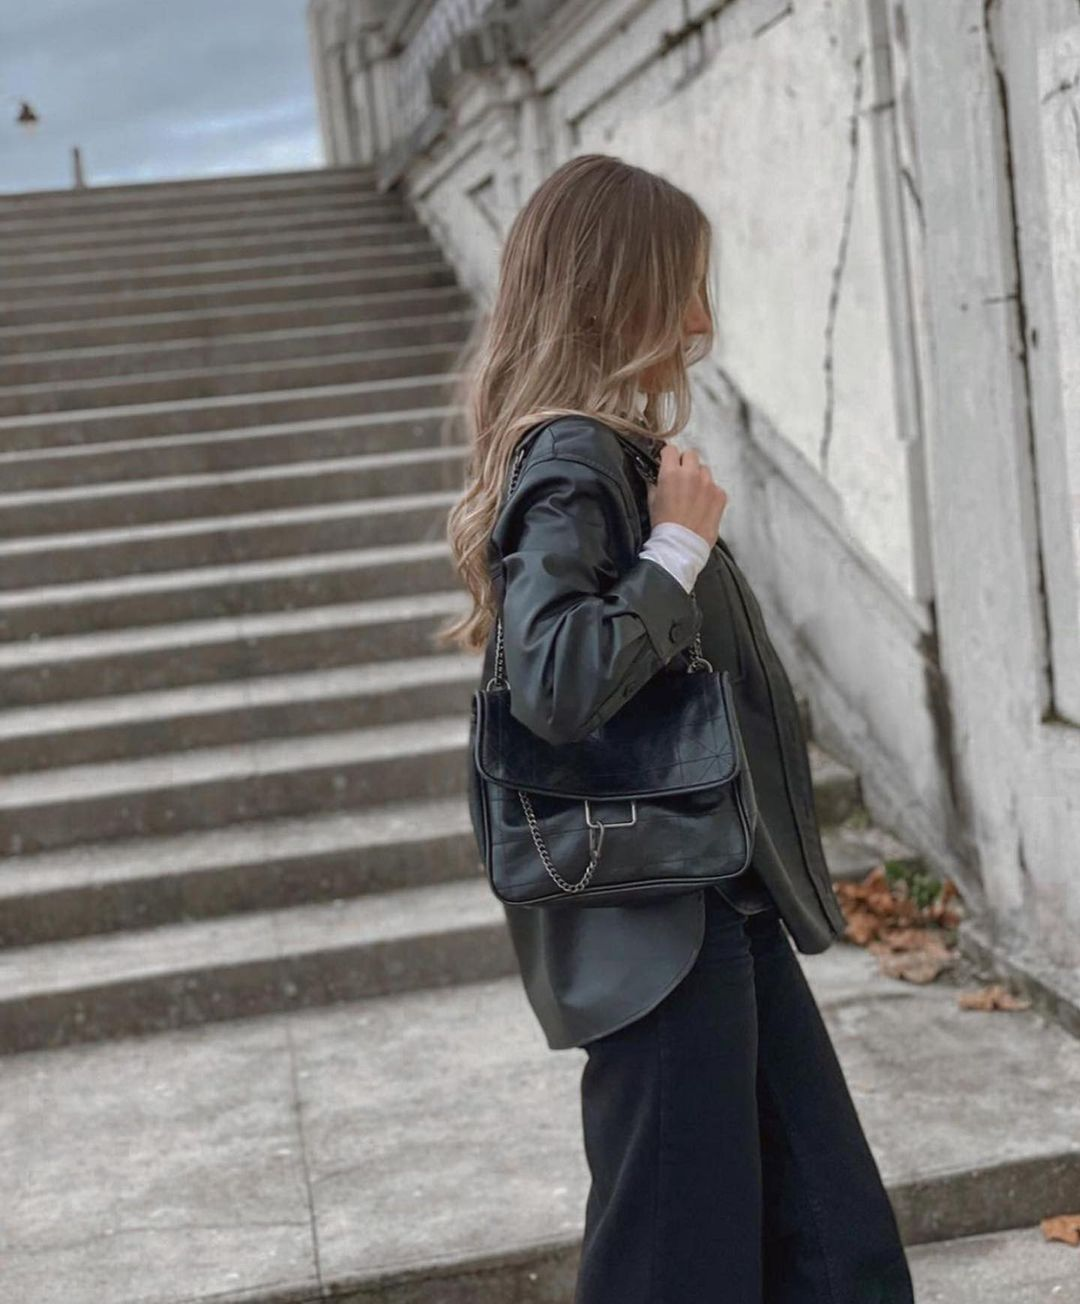 sac bandoulière portefeuille soft rock de Zara sur zara.outfits